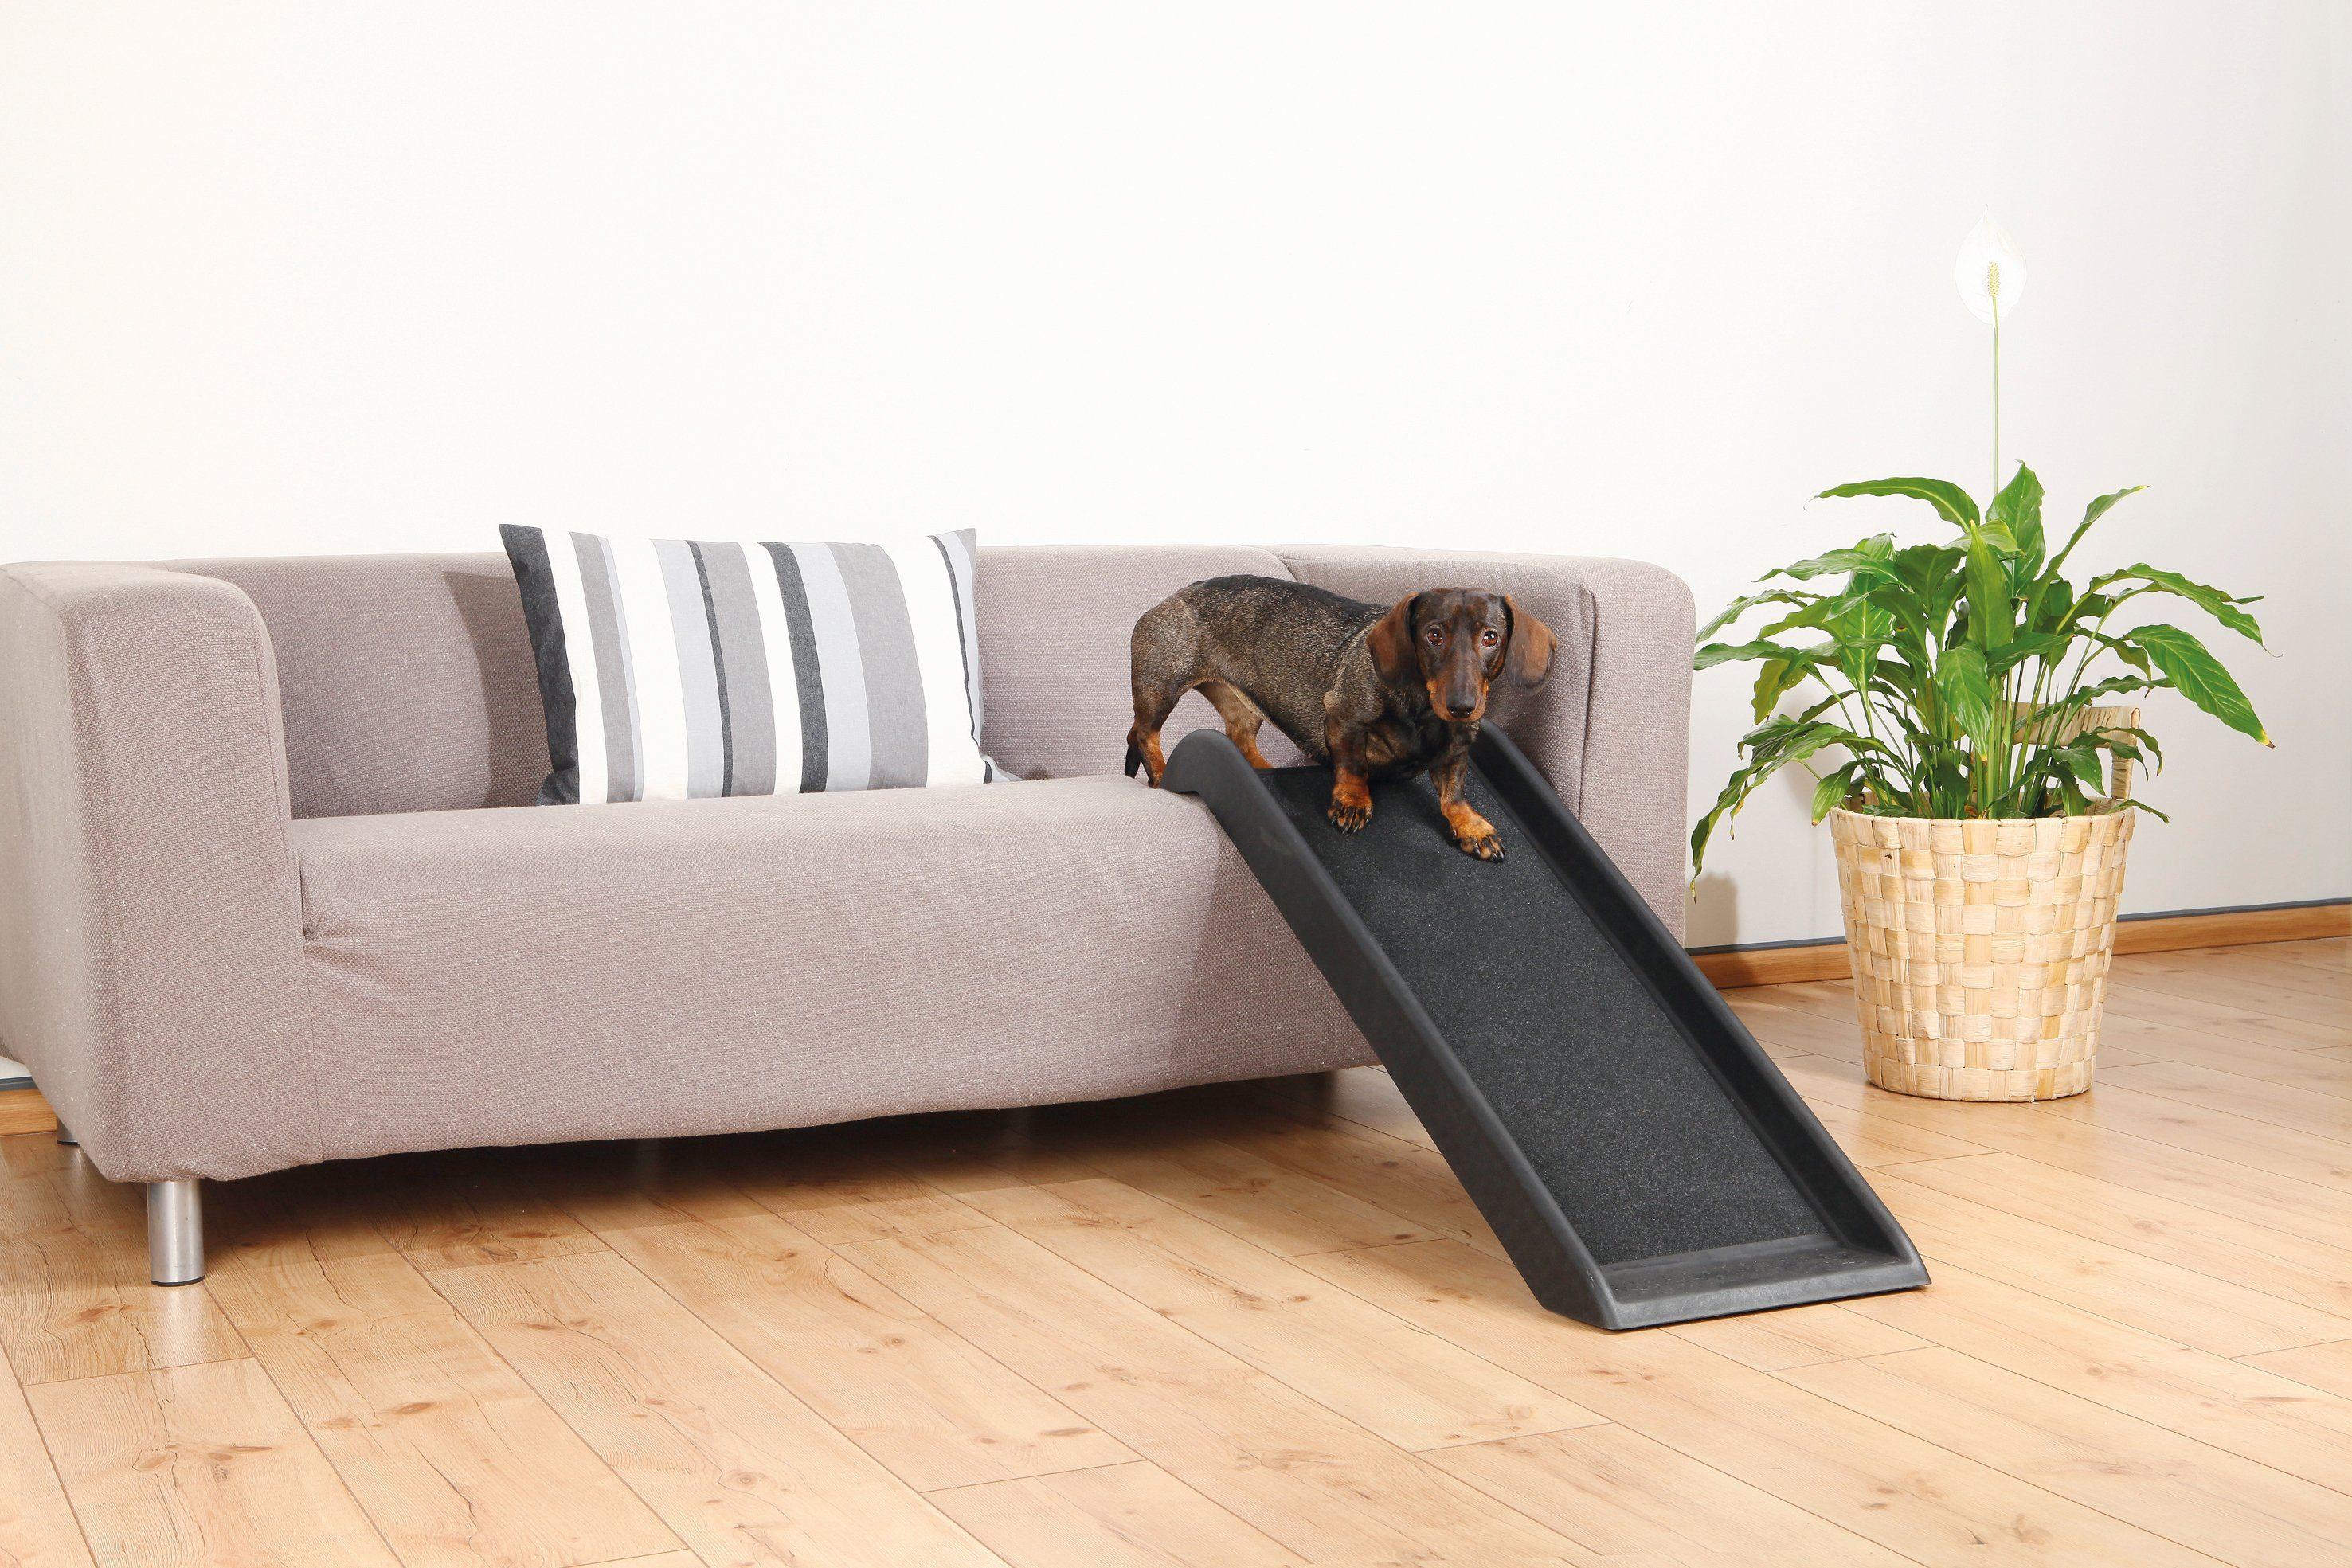 Hunde-Rampe »Petwalk«, BxL: 38x100 cm, belastbar bis 50 kg